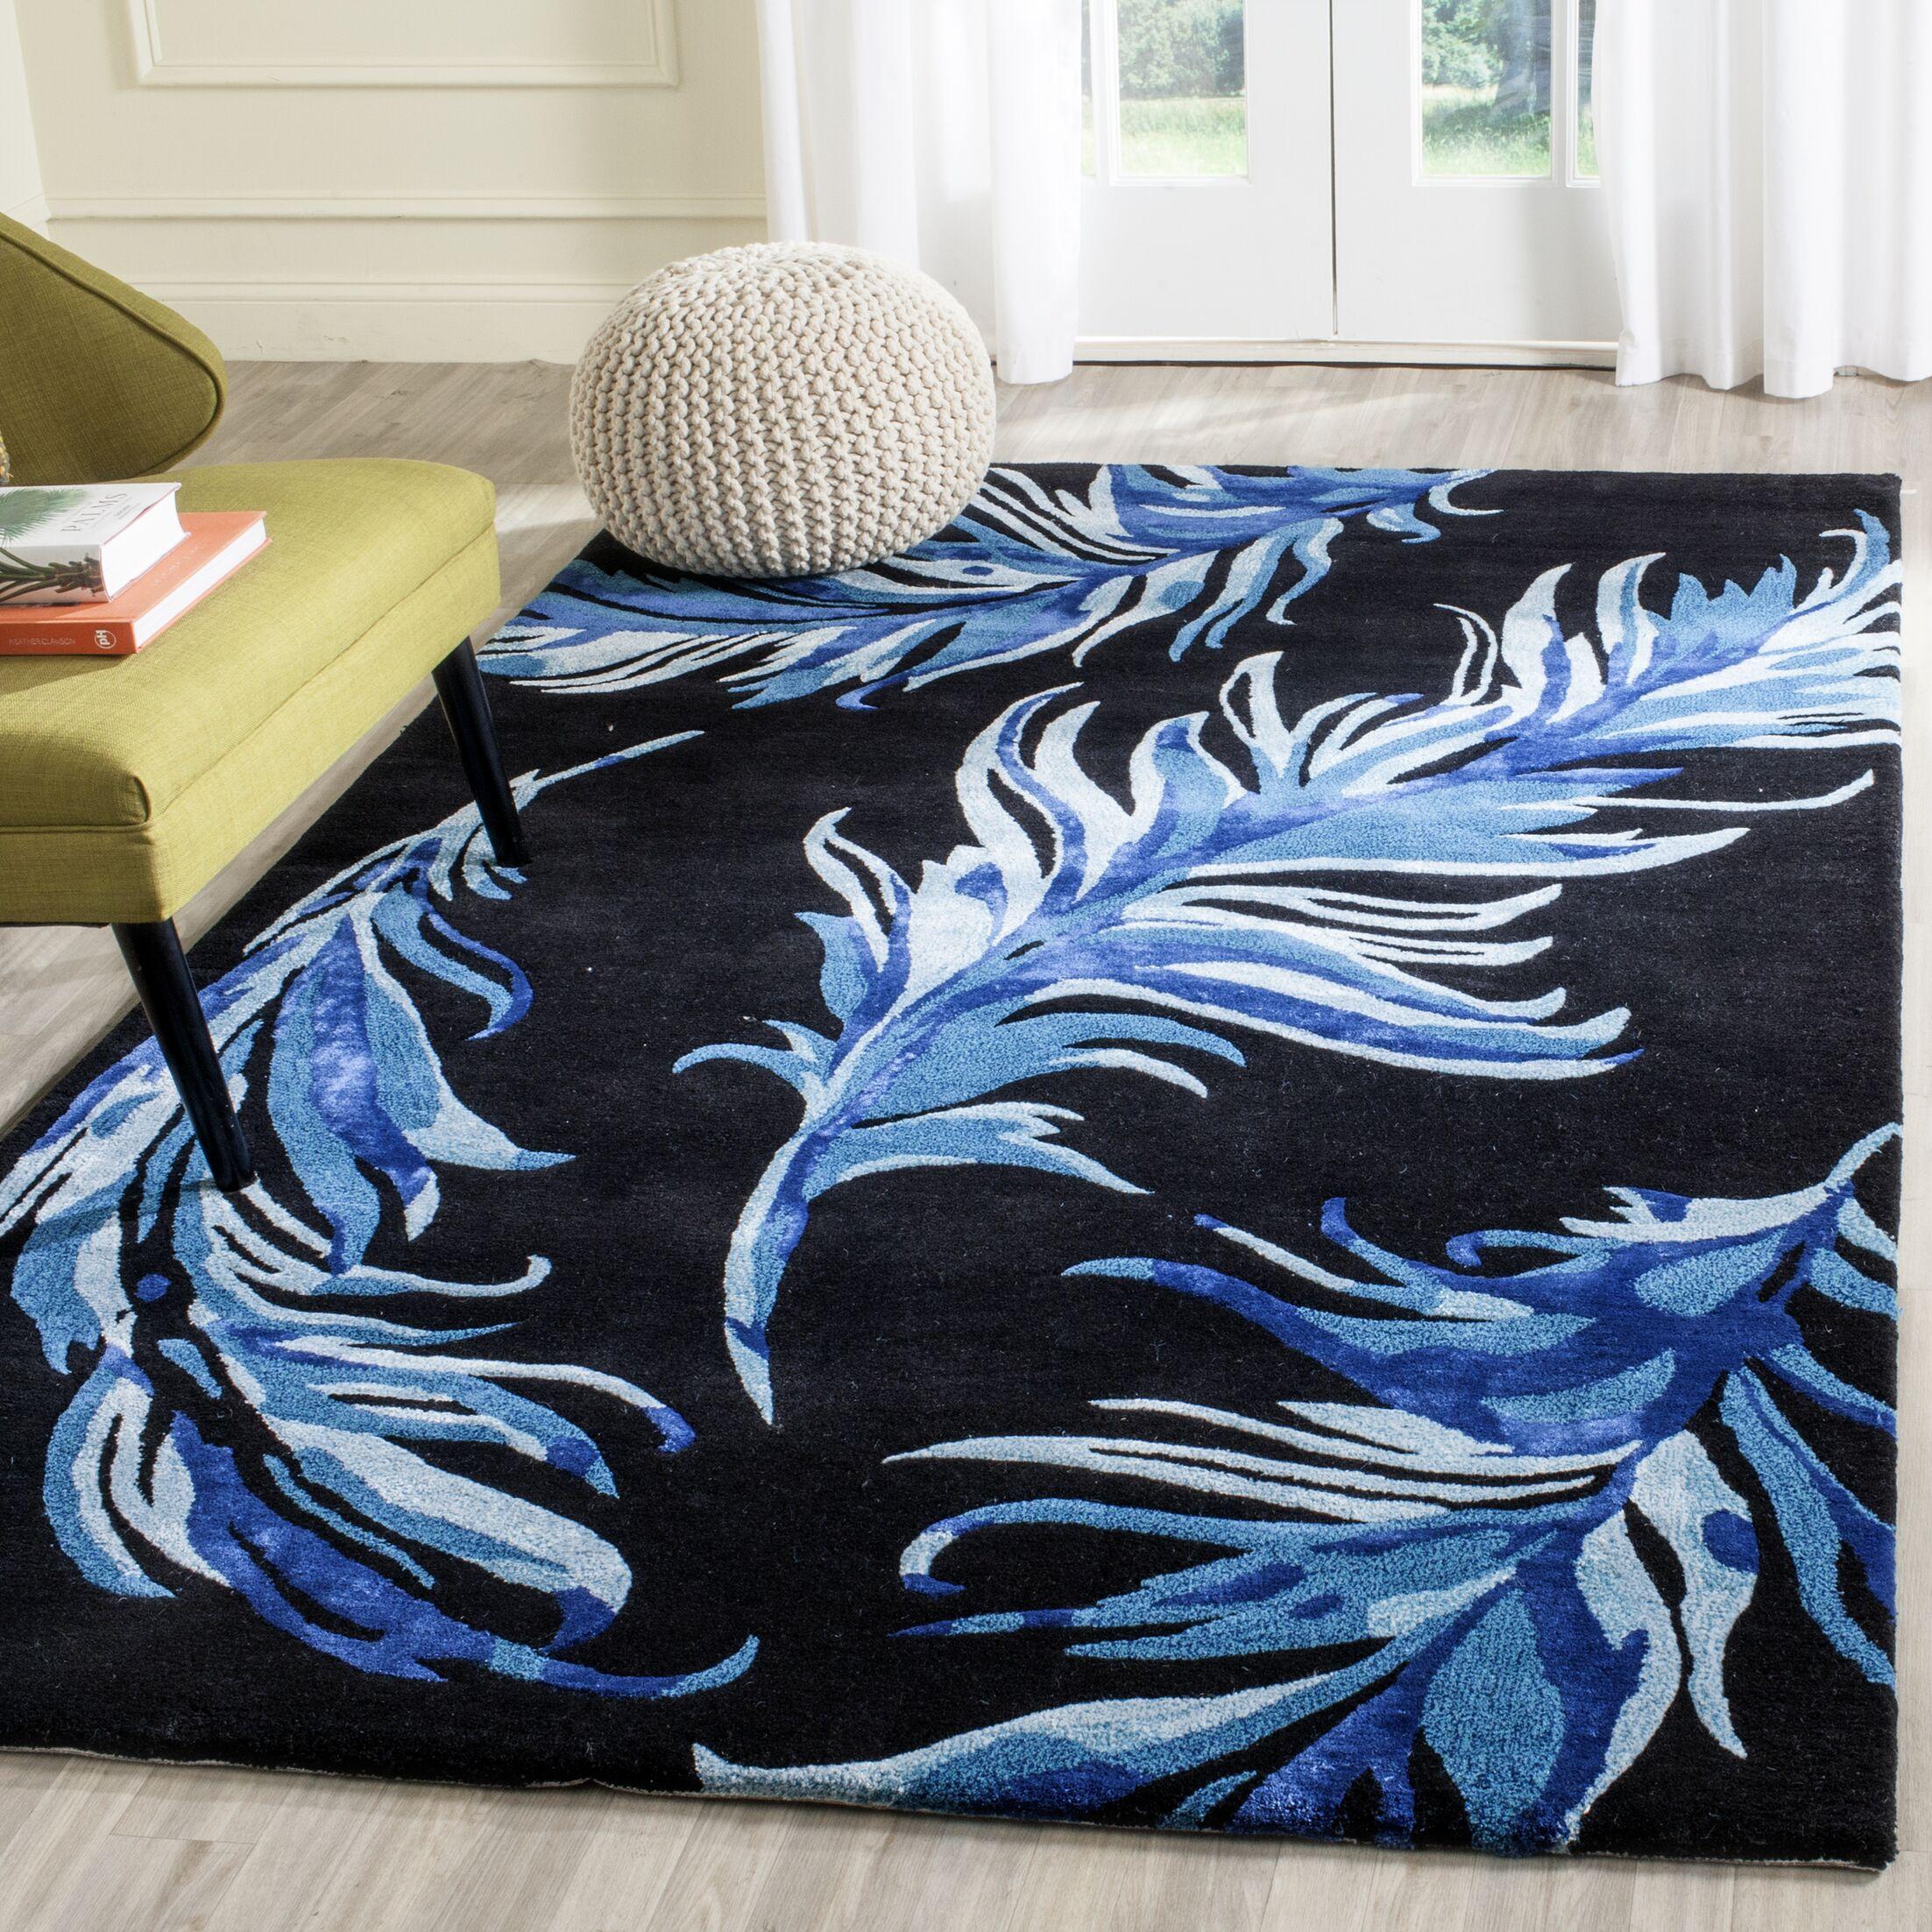 Leeds Black/Blue Area Rug Rug Size: Rectangle 8' x 10'